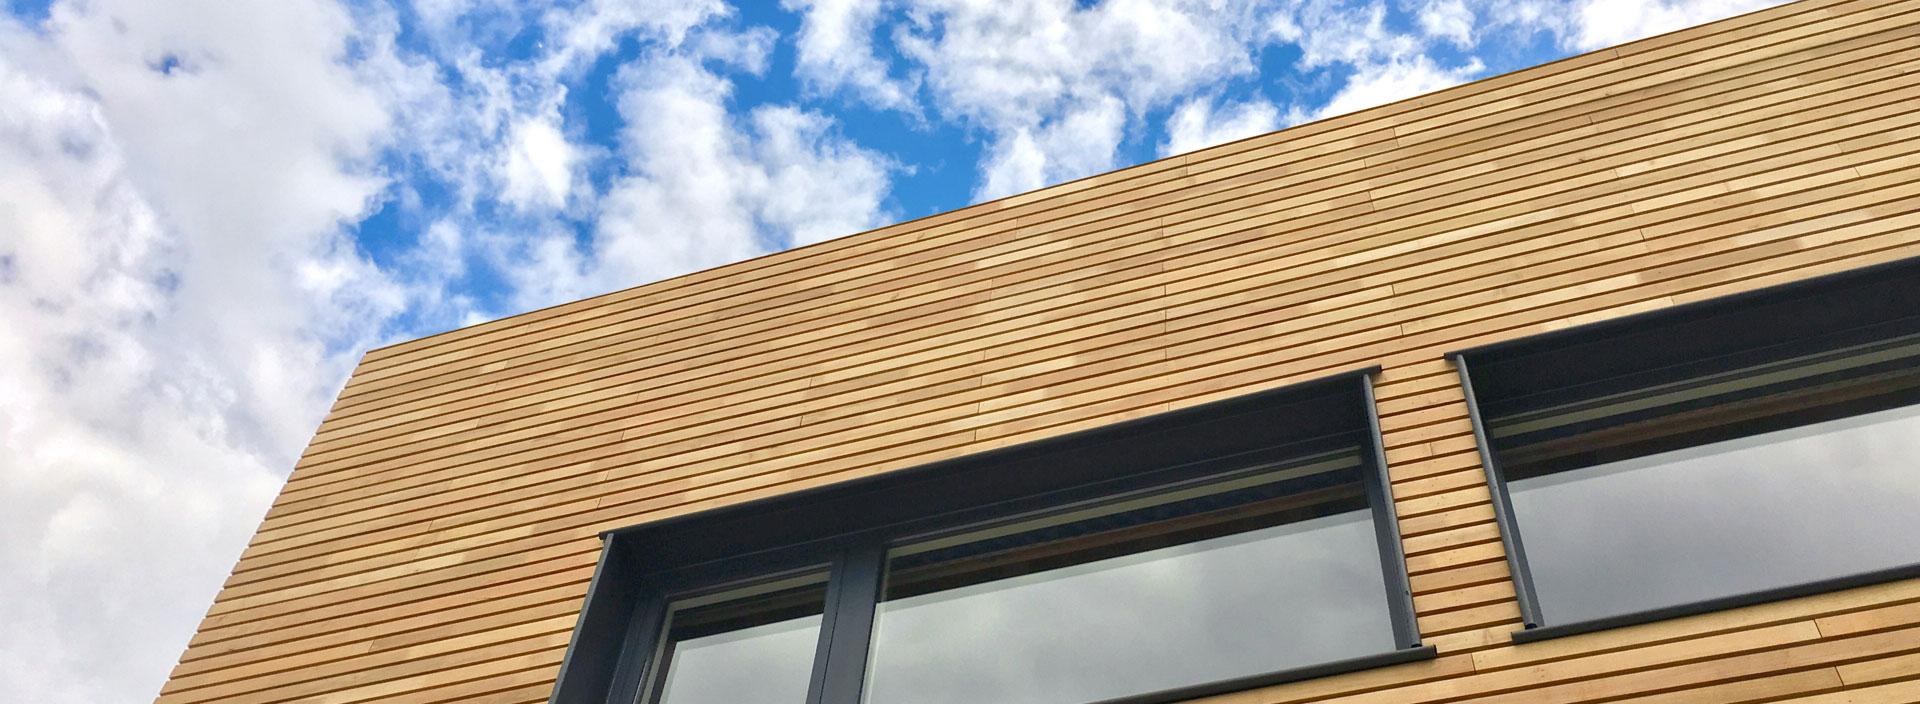 robinia wood robinienterrasse robinienfassaden. Black Bedroom Furniture Sets. Home Design Ideas